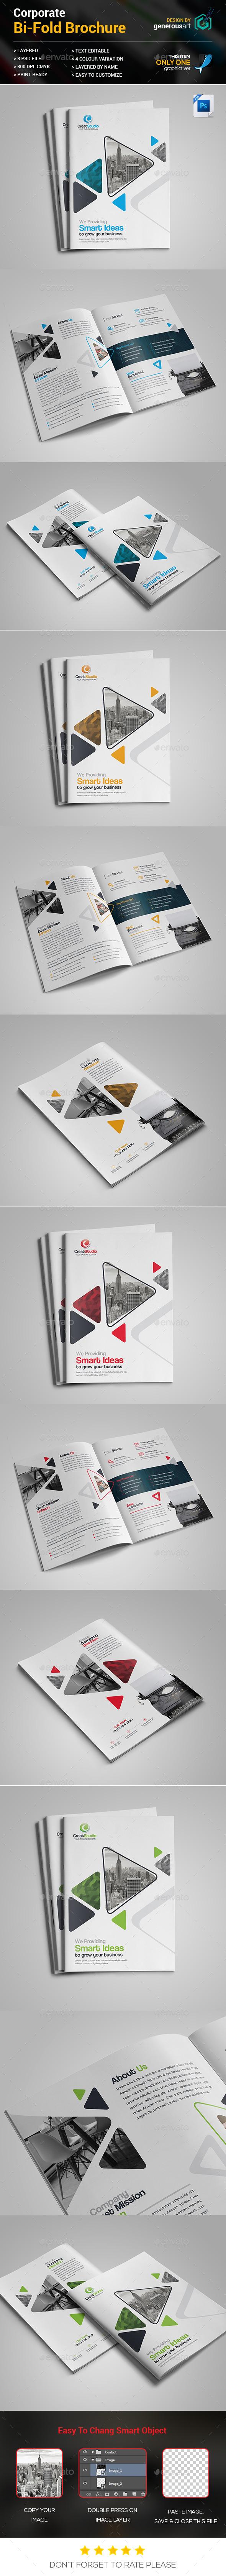 Business Bi-Fold Brochure - Corporate Brochures